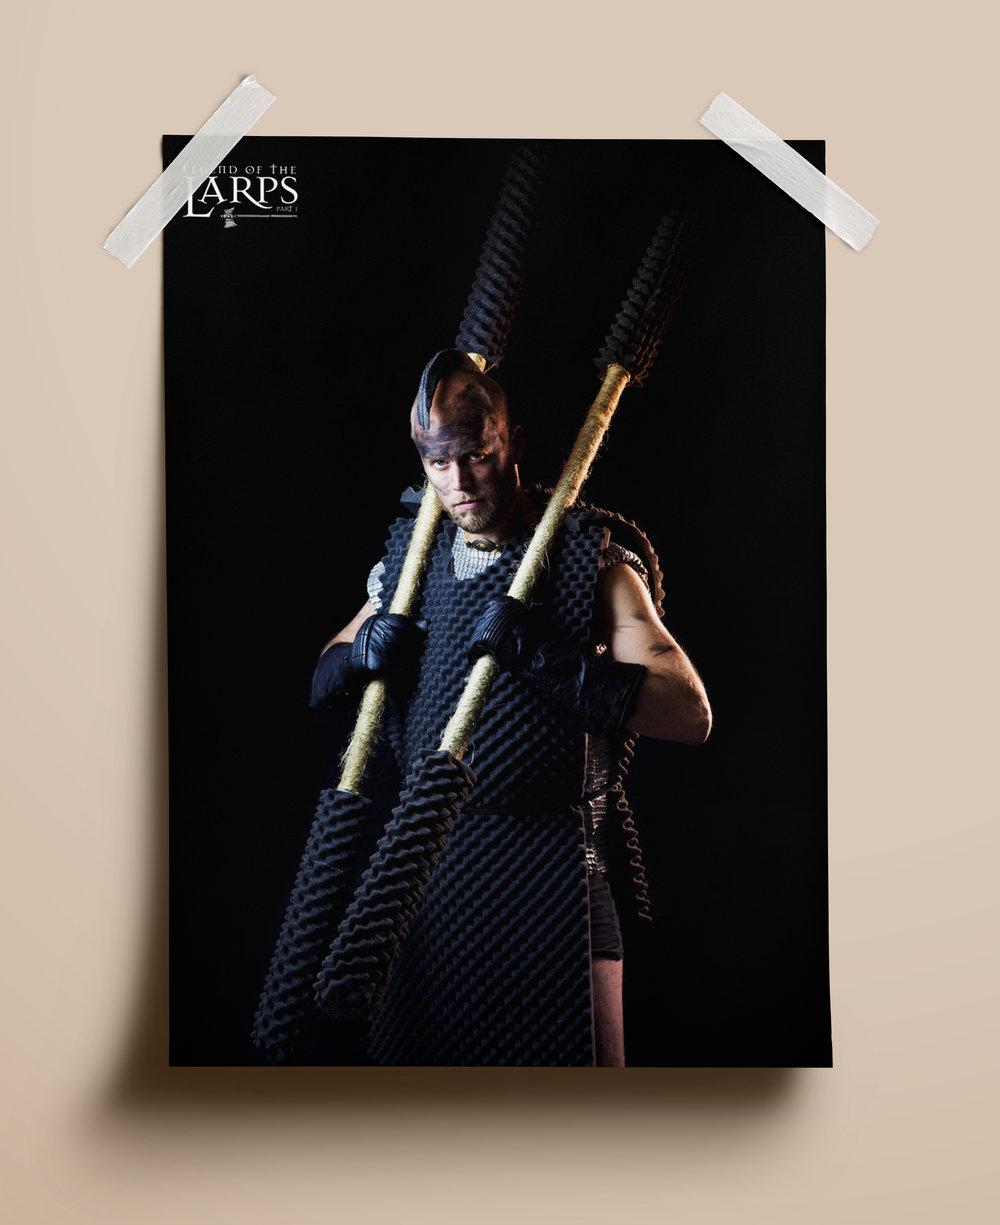 A3-Poster-Mockup-vol-10.jpg